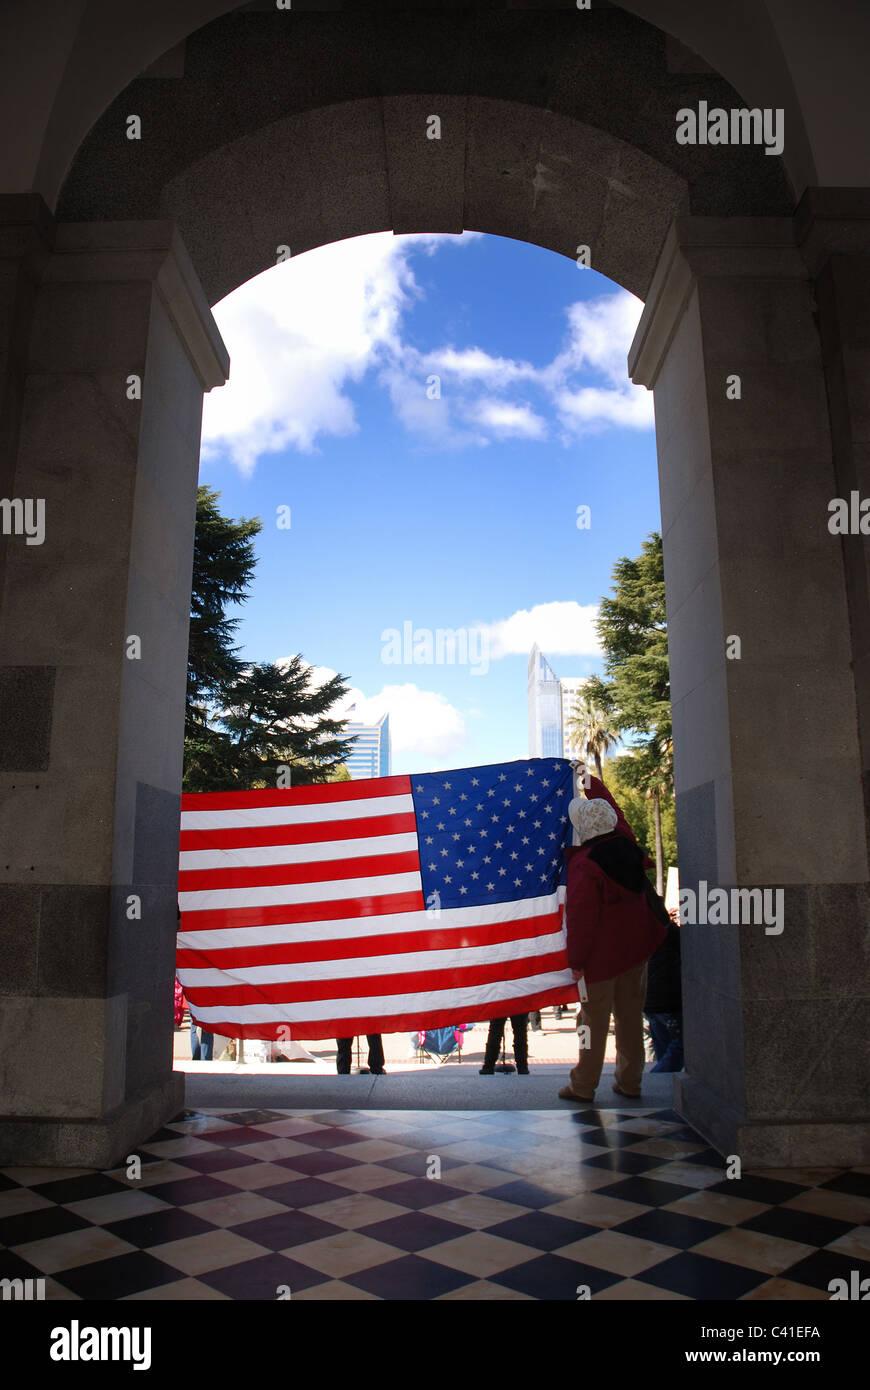 American flag at rally in Sacramento Stock Photo